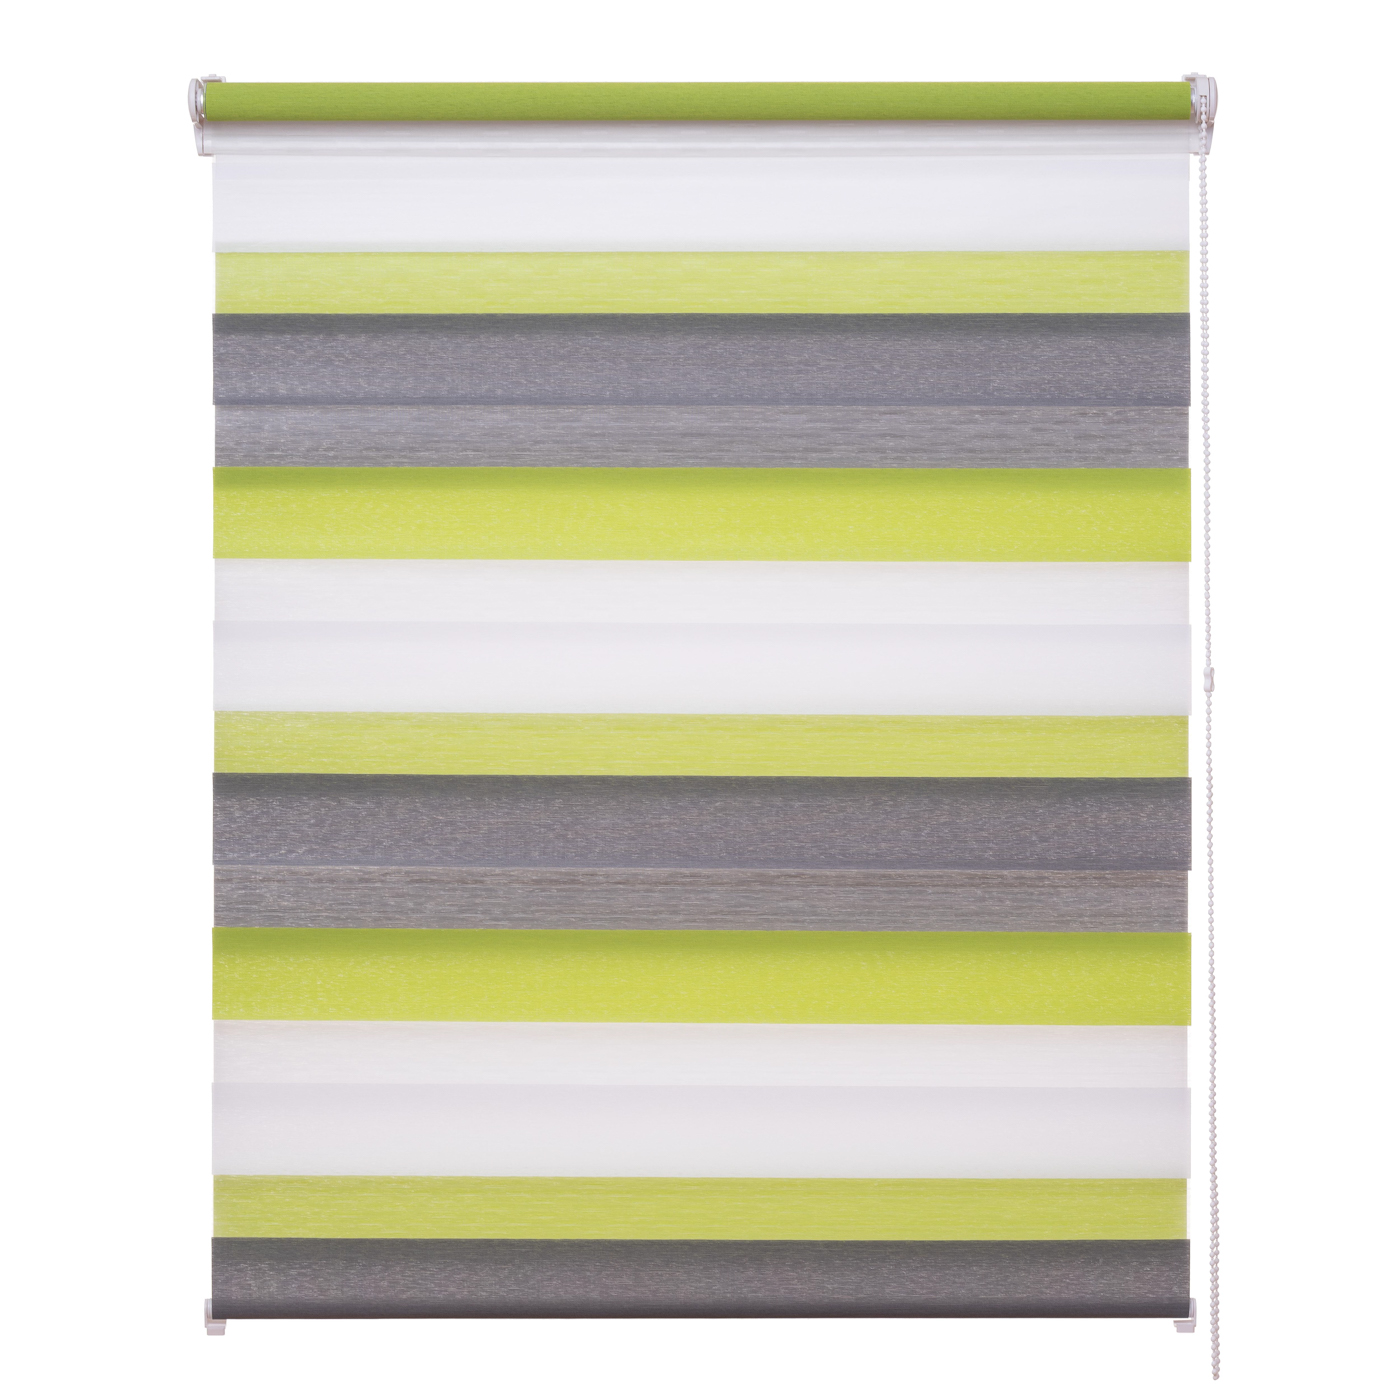 doppelrollo duo rollo 3 farbig verspannt gr n grau anthra klemmfix ohne bohren ebay. Black Bedroom Furniture Sets. Home Design Ideas